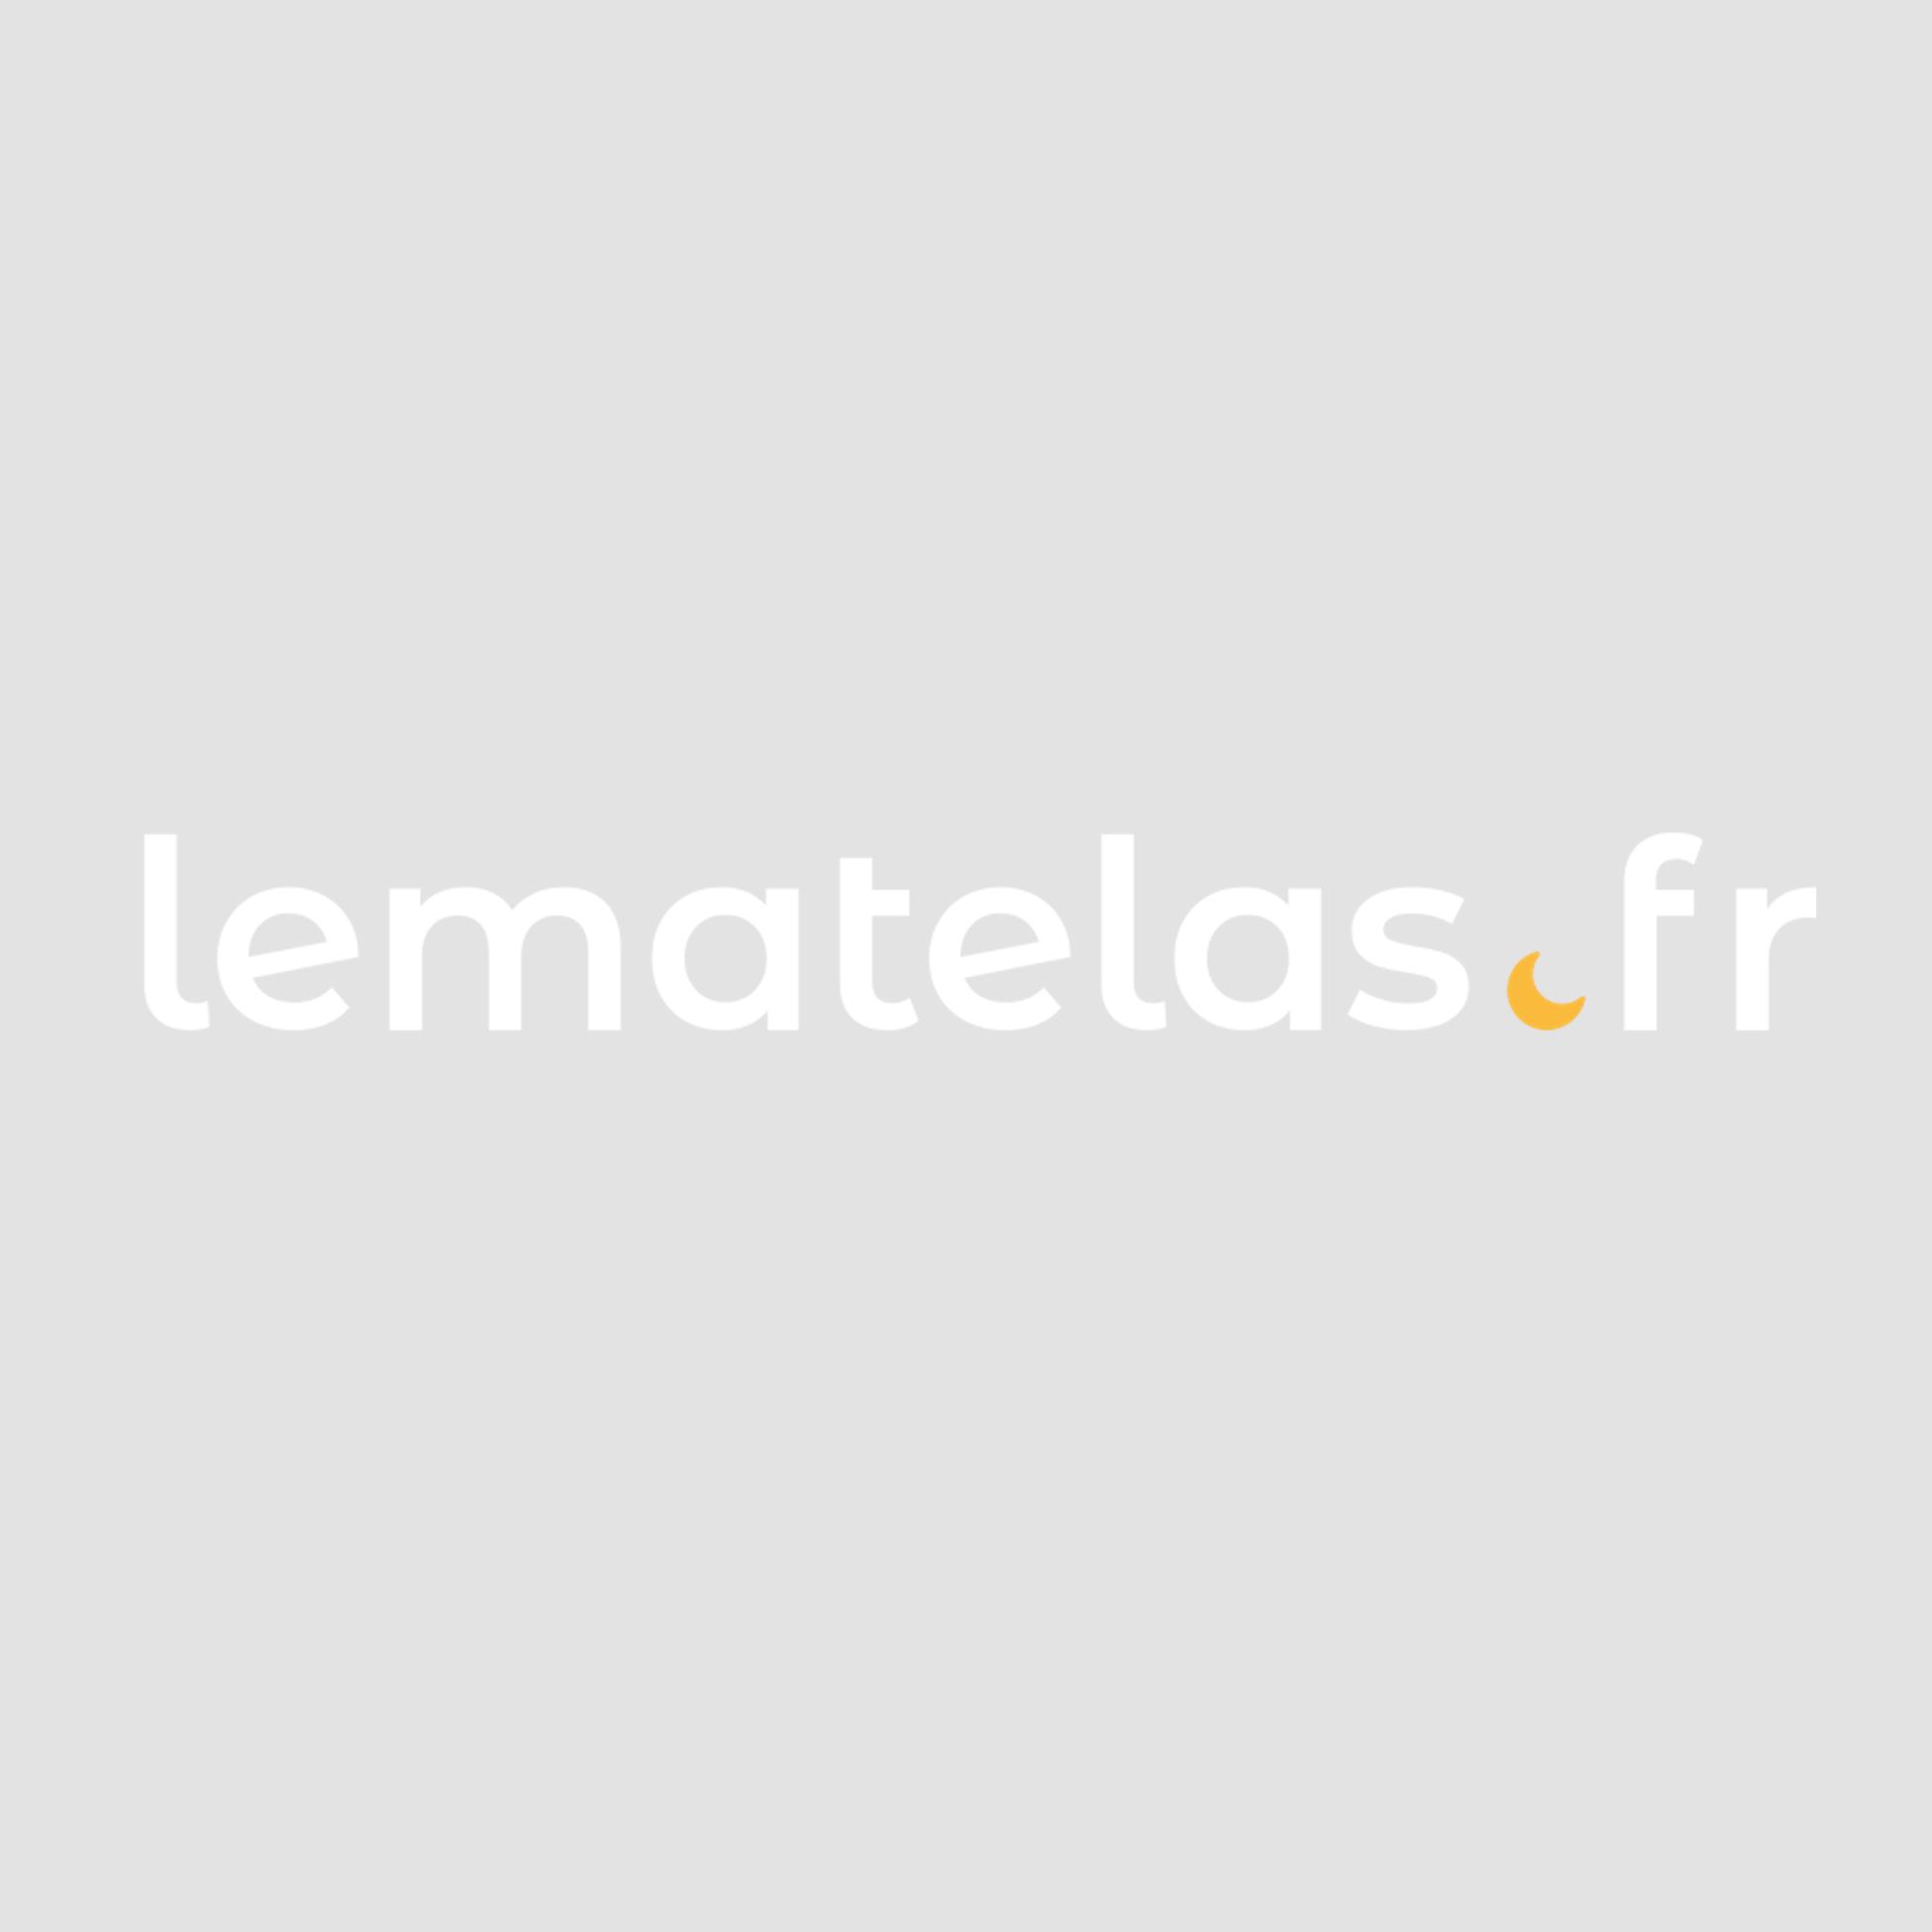 Baby Fox Berceau cododo en bois gris réglable en hauteur 40x80